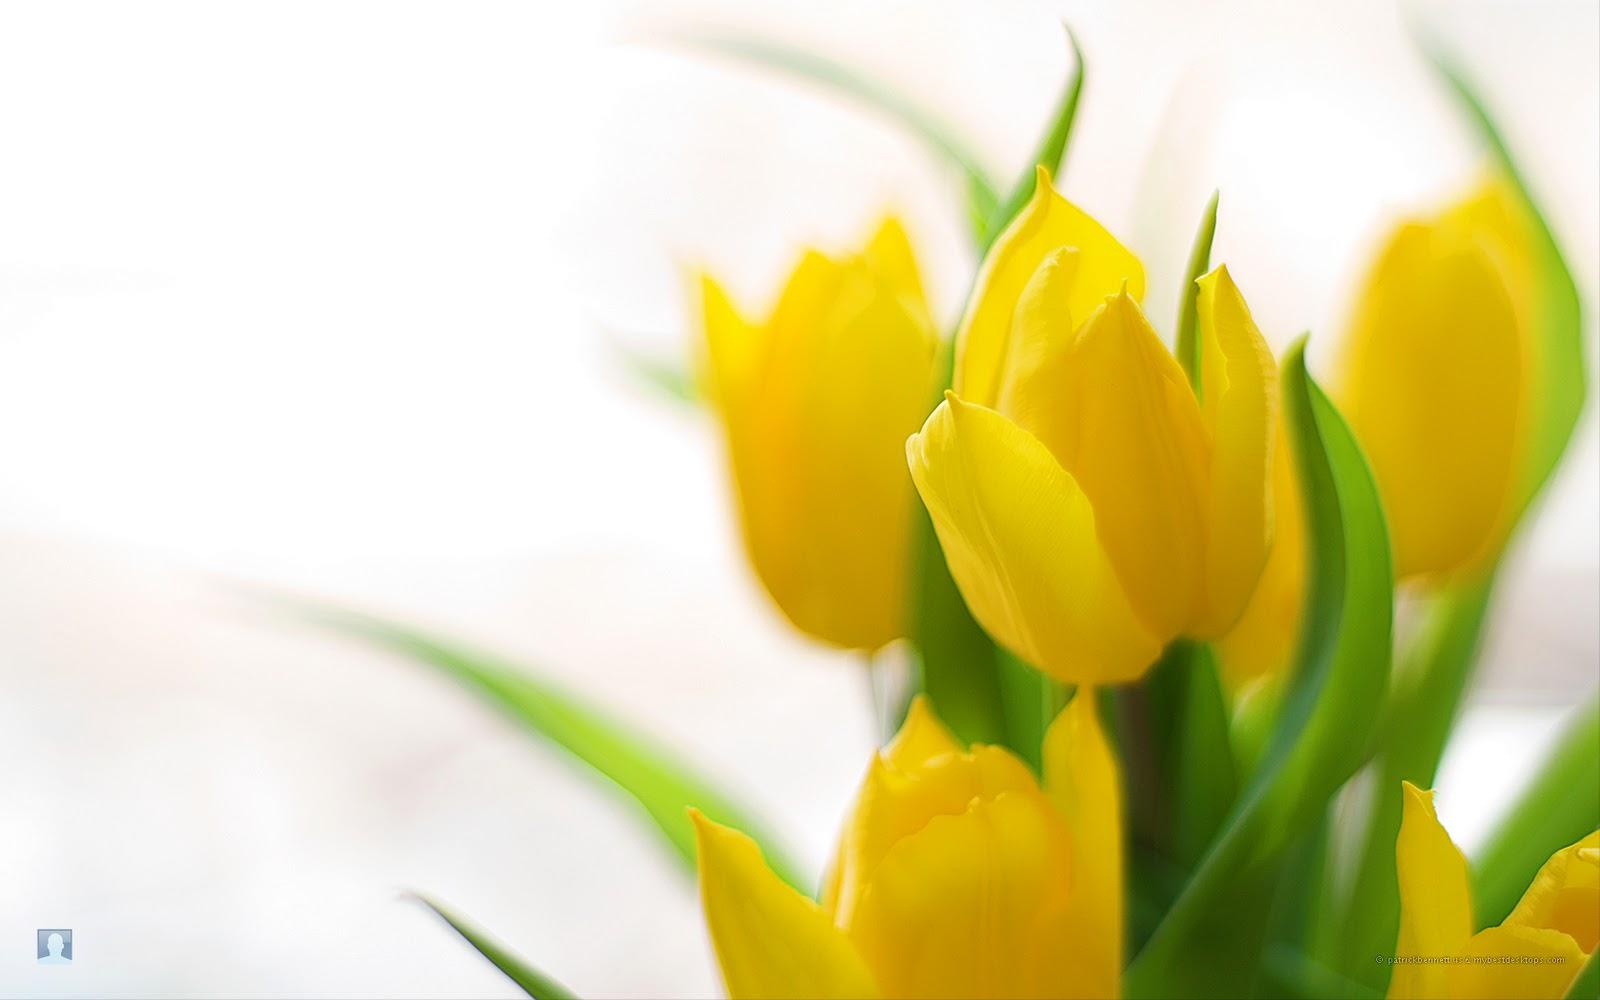 http://2.bp.blogspot.com/-PyYdu7mKank/TvNX8AZtPKI/AAAAAAAAEDw/526HADB63Jw/s1600/spring-flowers-5.jpg